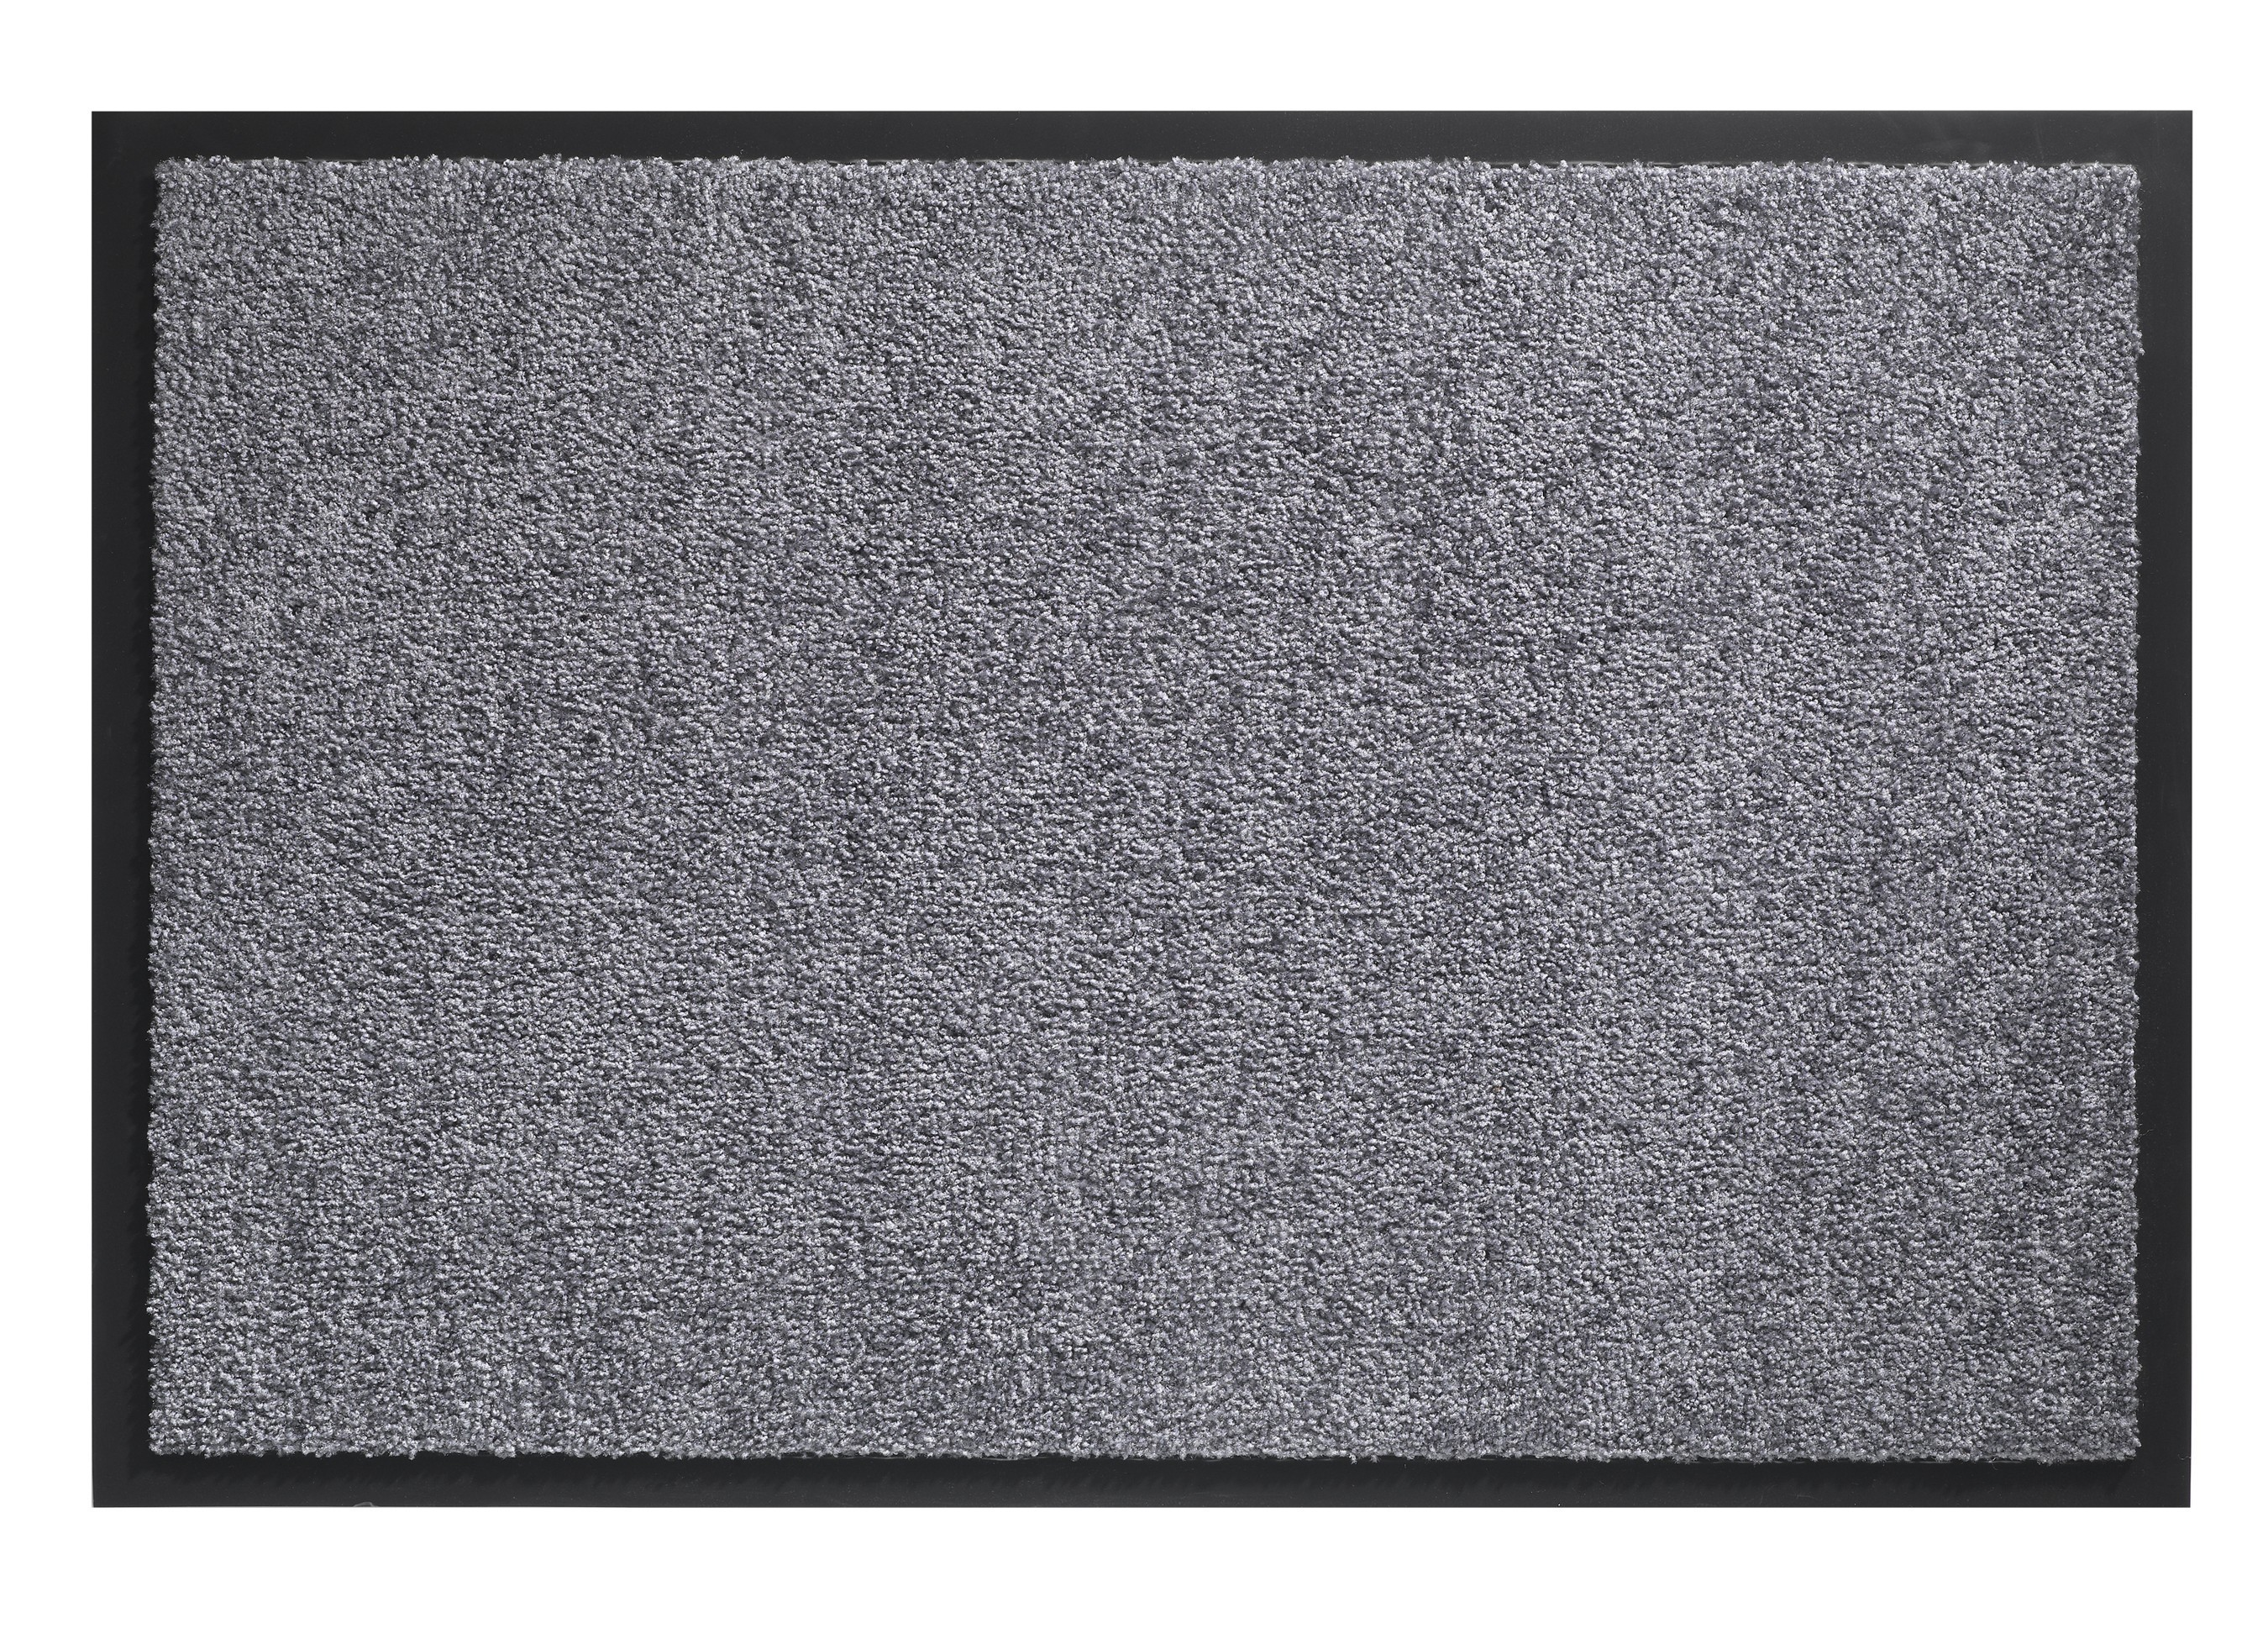 Hamat Schmutzfangmatte Twister 60x80cm grey Bild 1